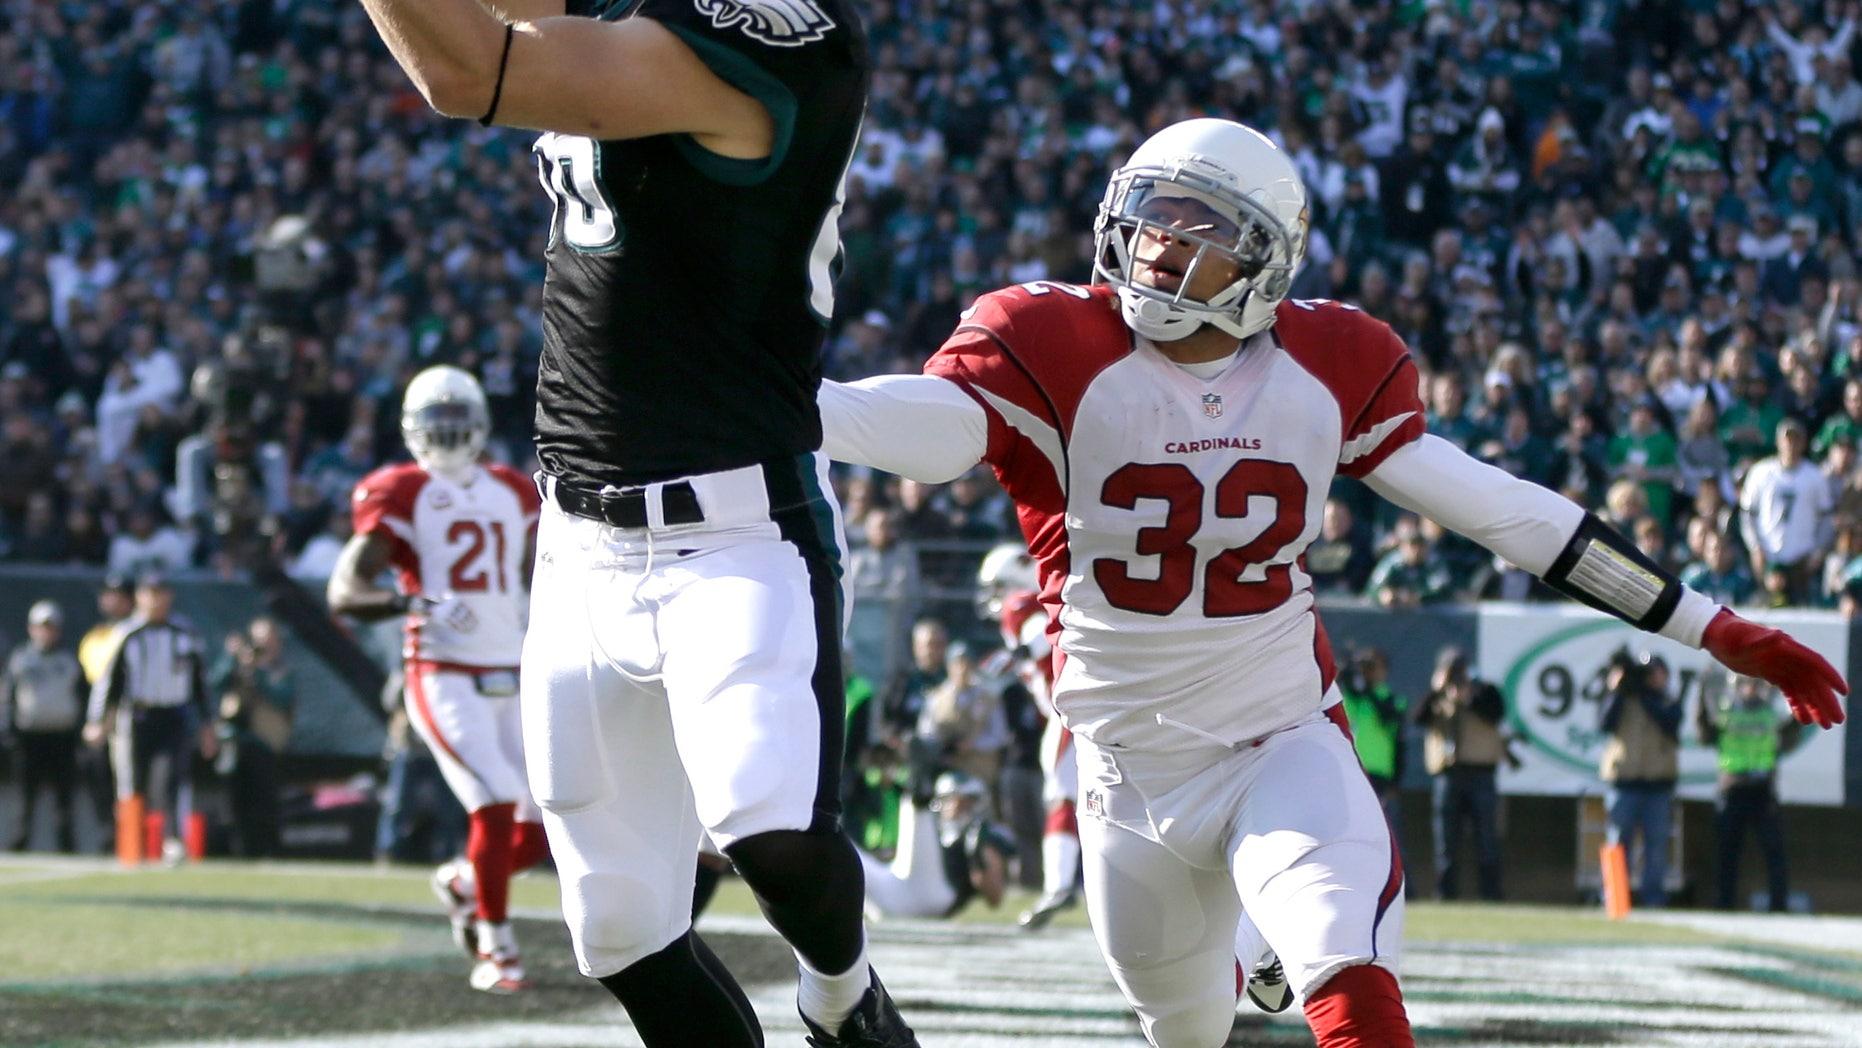 Philadelphia Eagles' Zach Ertz, left, pulls in a touchdown pass as Arizona Cardinals' Tyrann Mathieu defends during the first half of an NFL football game, Sunday, Dec. 1, 2013, in Philadelphia. (AP Photo/Matt Rourke)